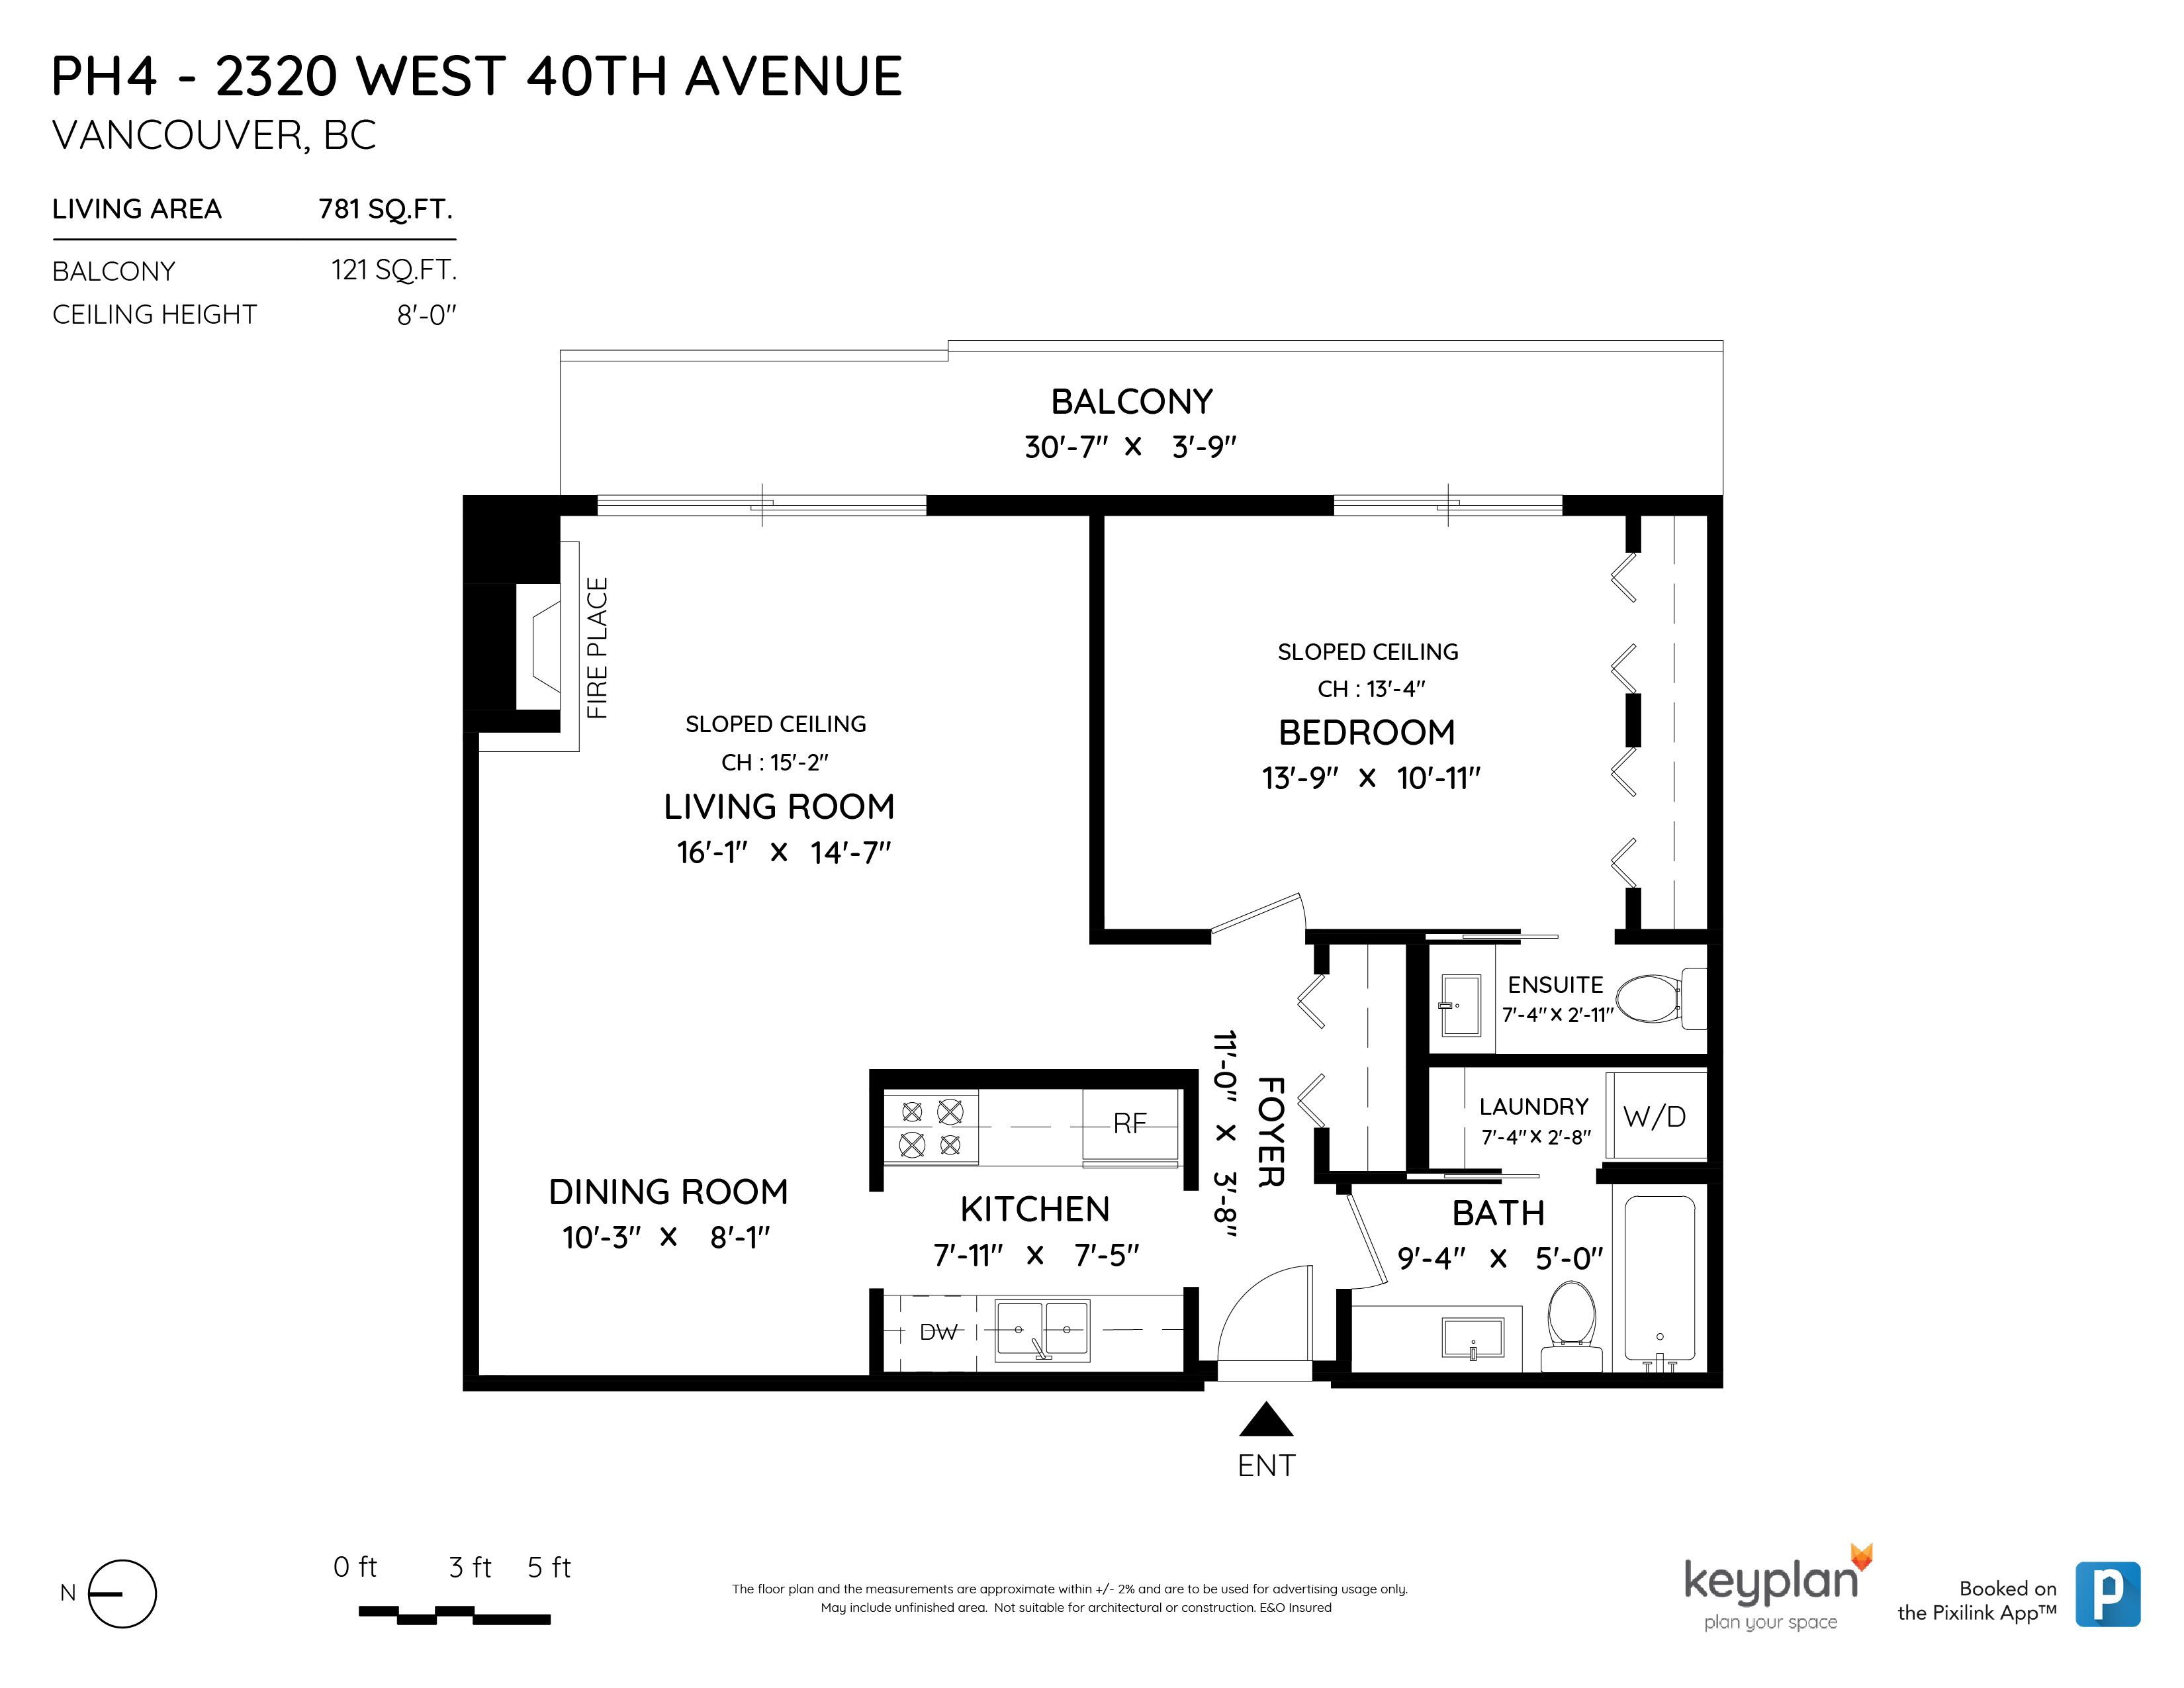 PH4 2320 W 40TH AVENUE, Vancouver, BC Floor Plan